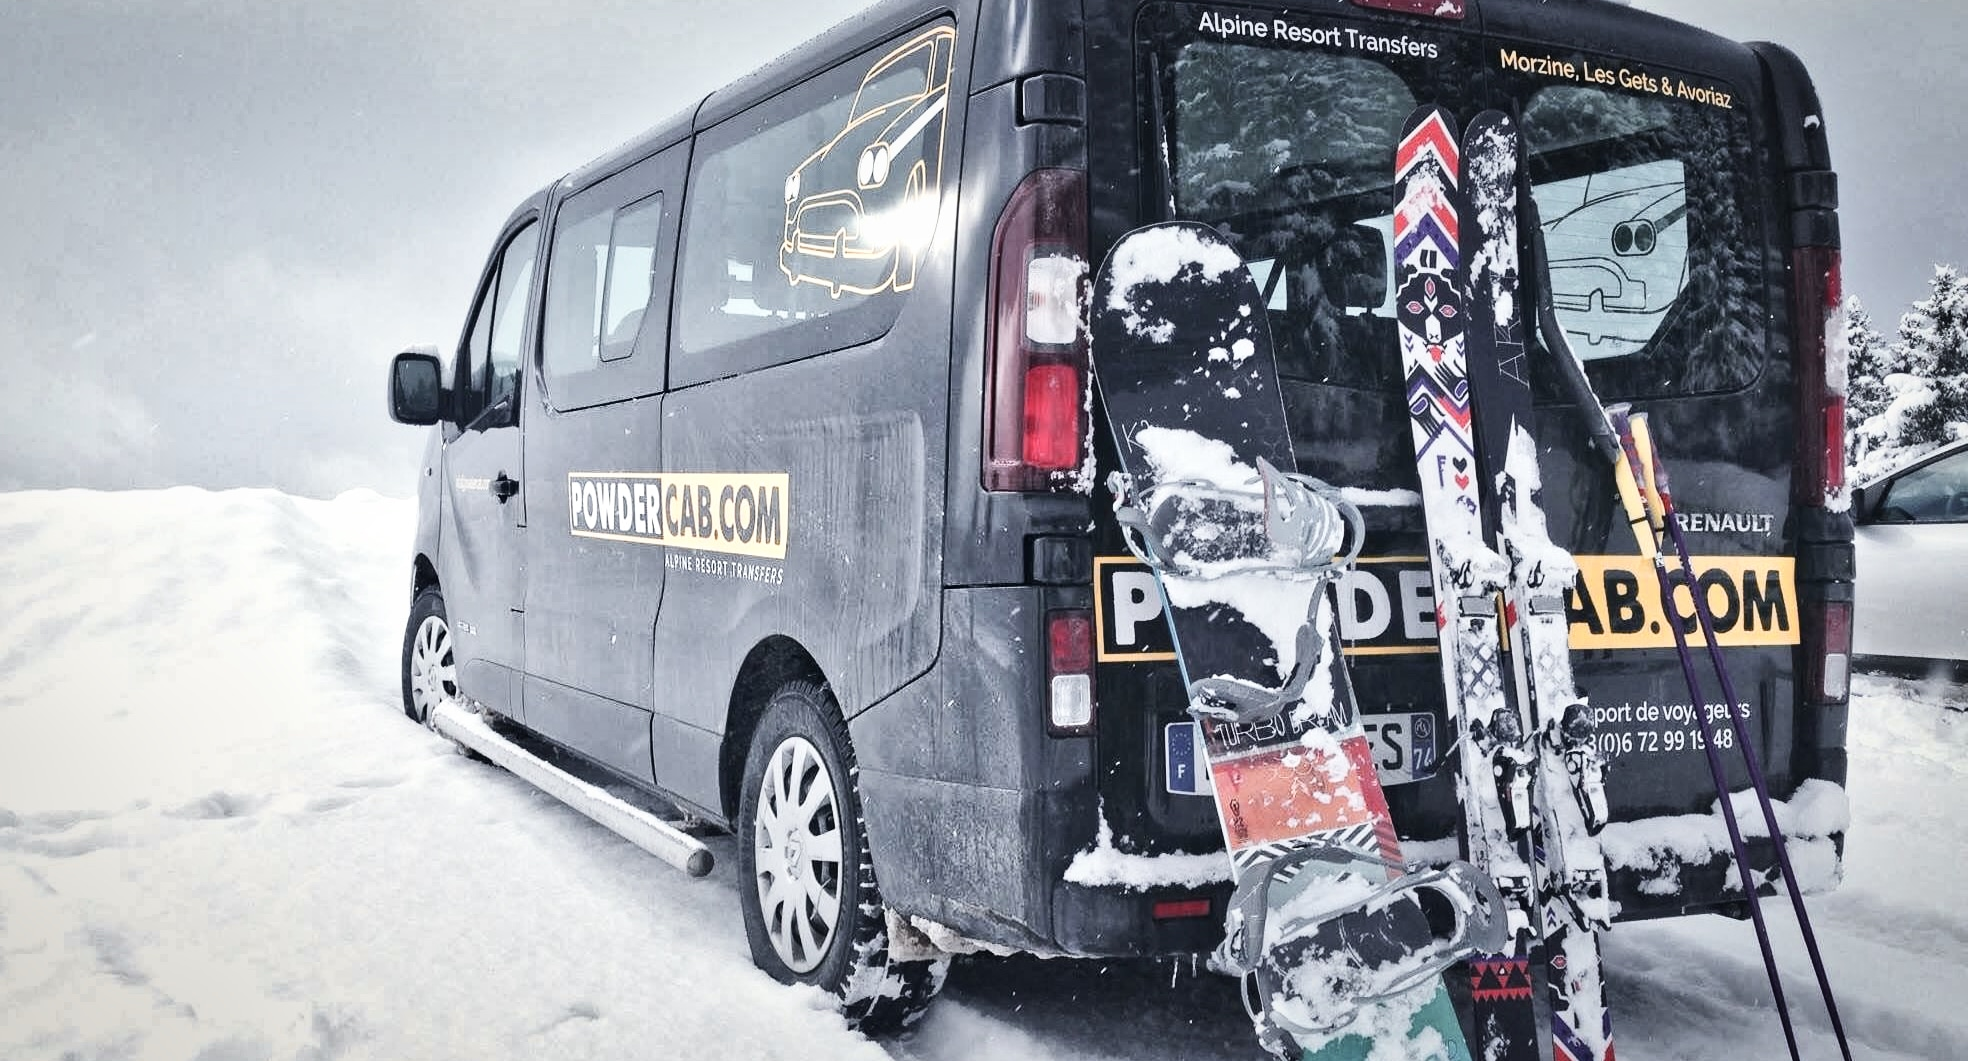 PowderCab van in the snow